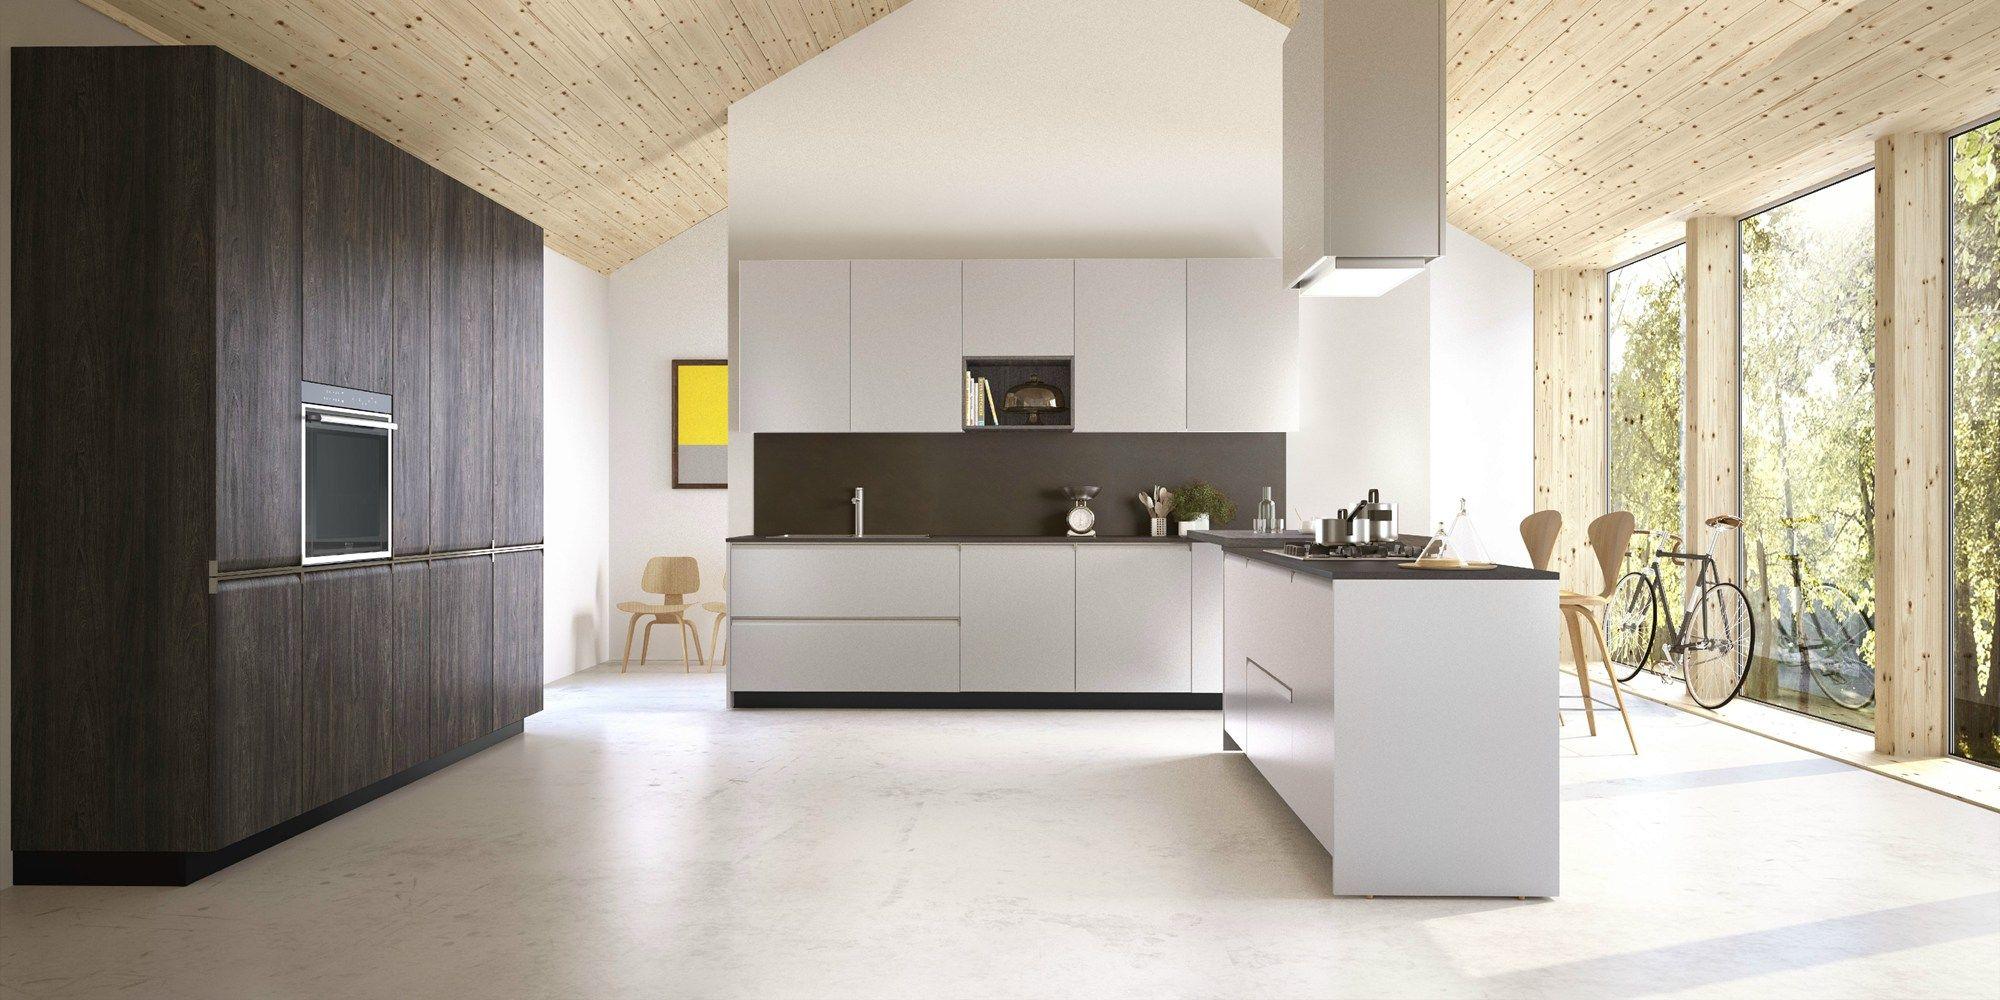 Cucine Ikea Genova: Cucine country chic mattonelle cucina muratura ...